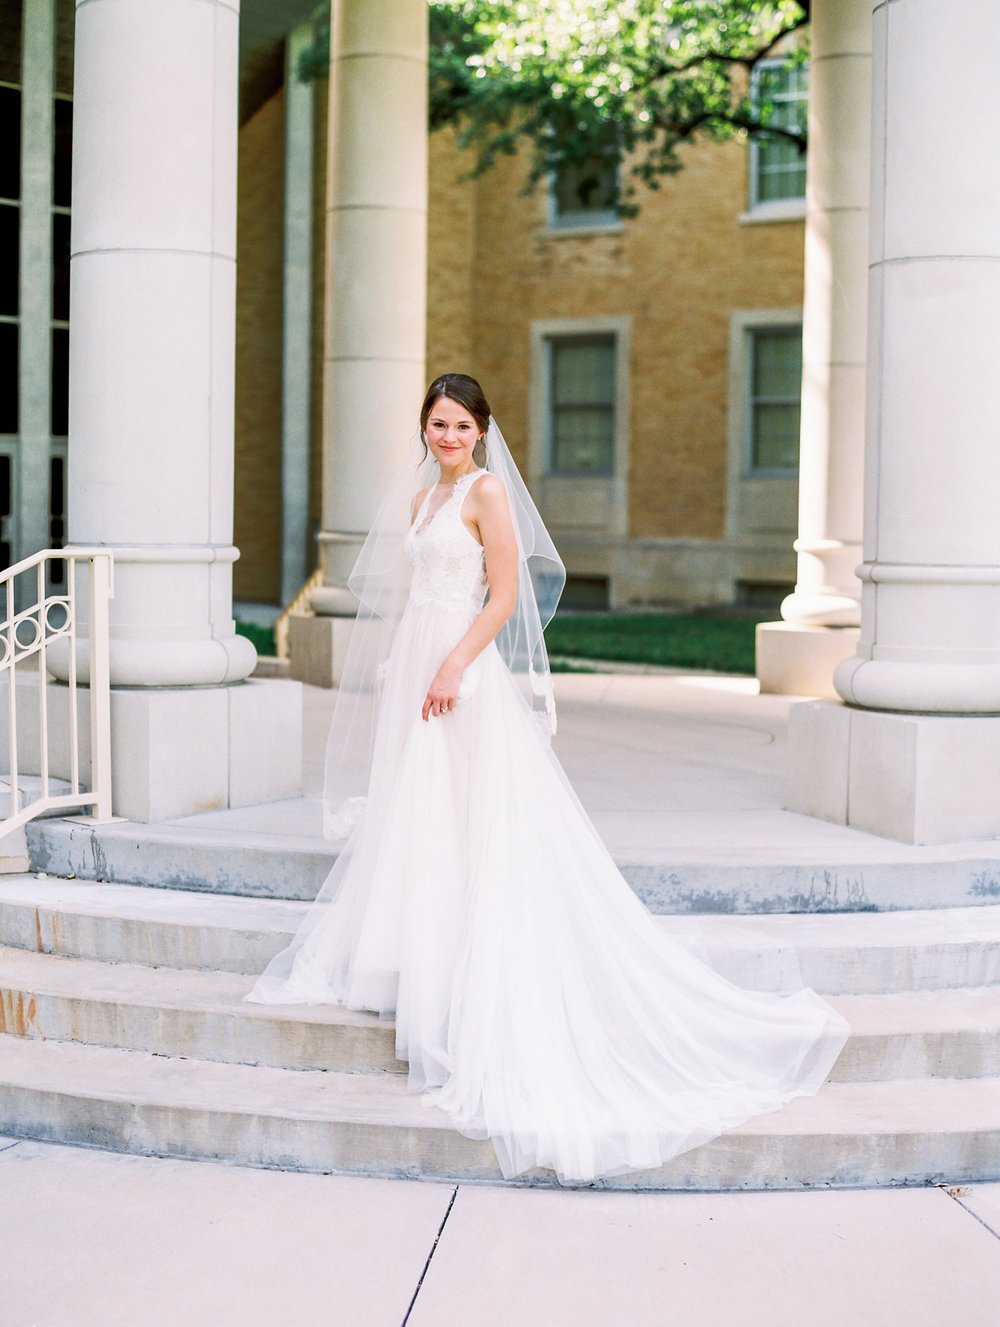 Hill Country Wedding Austin Texas Wedding Photographer_0081.jpg